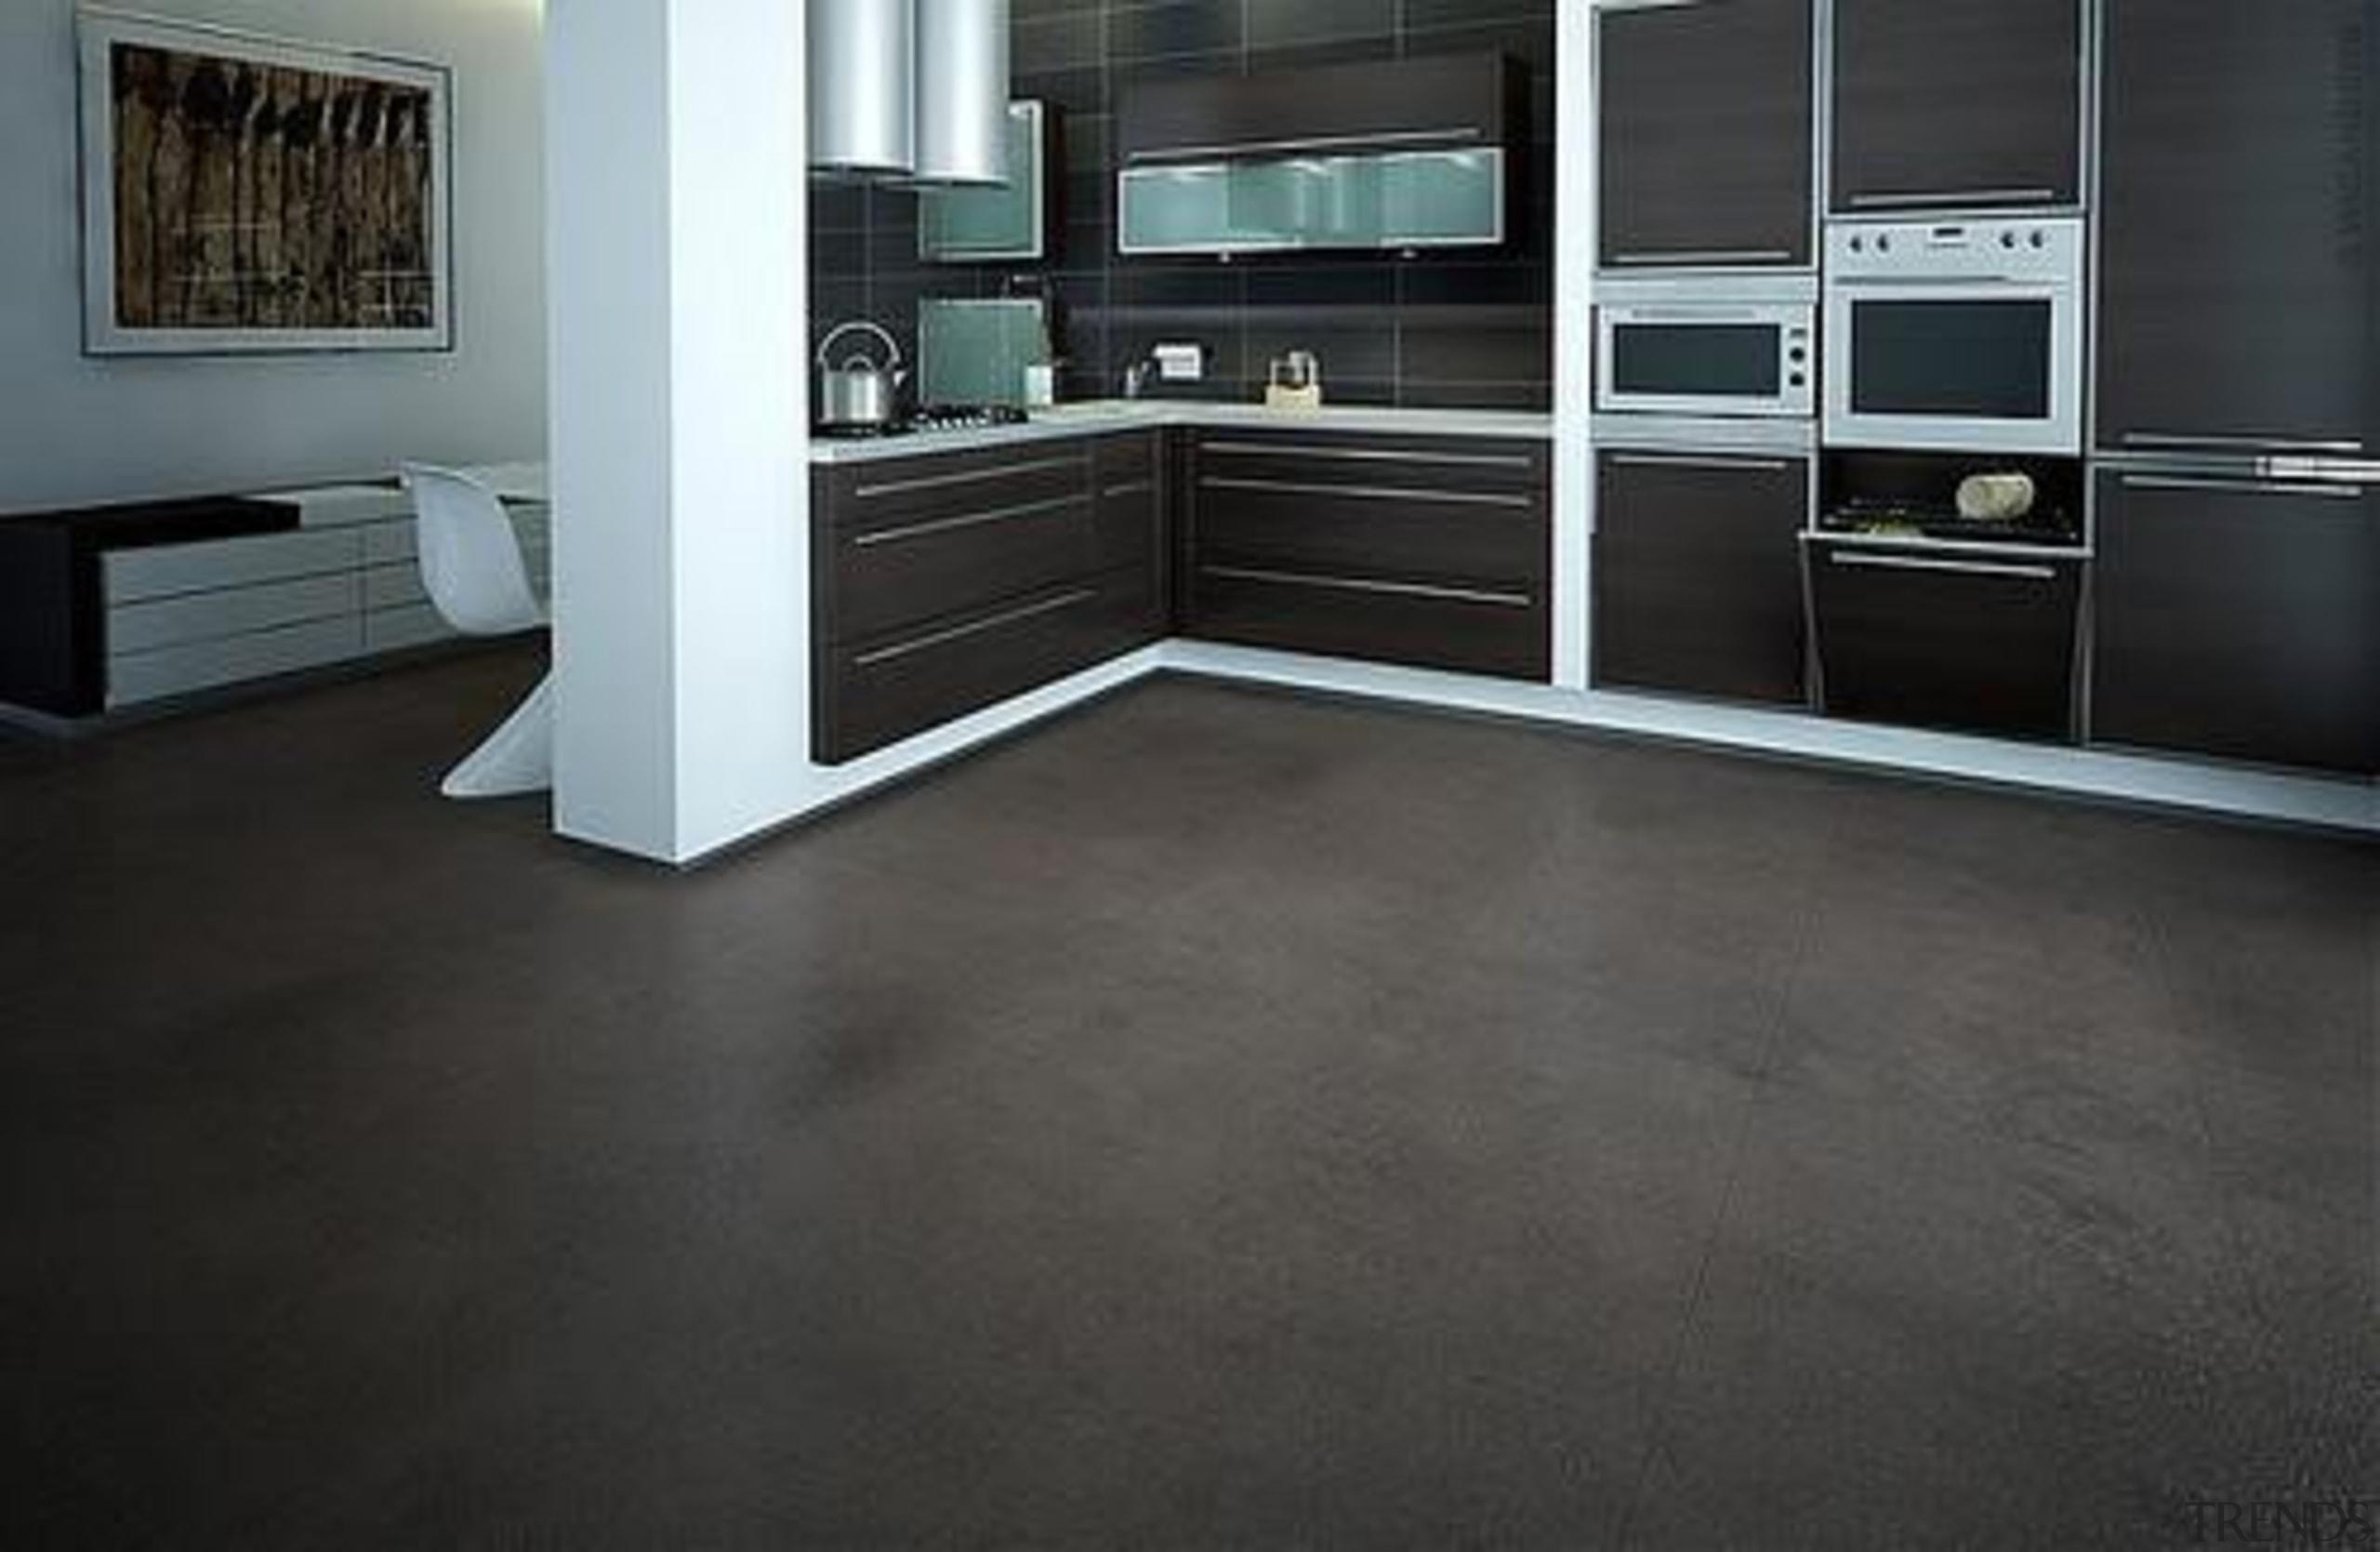 Cork Comfort - Pebbles Storm - Cork Comfort floor, flooring, hardwood, laminate flooring, tile, wood, wood flooring, black